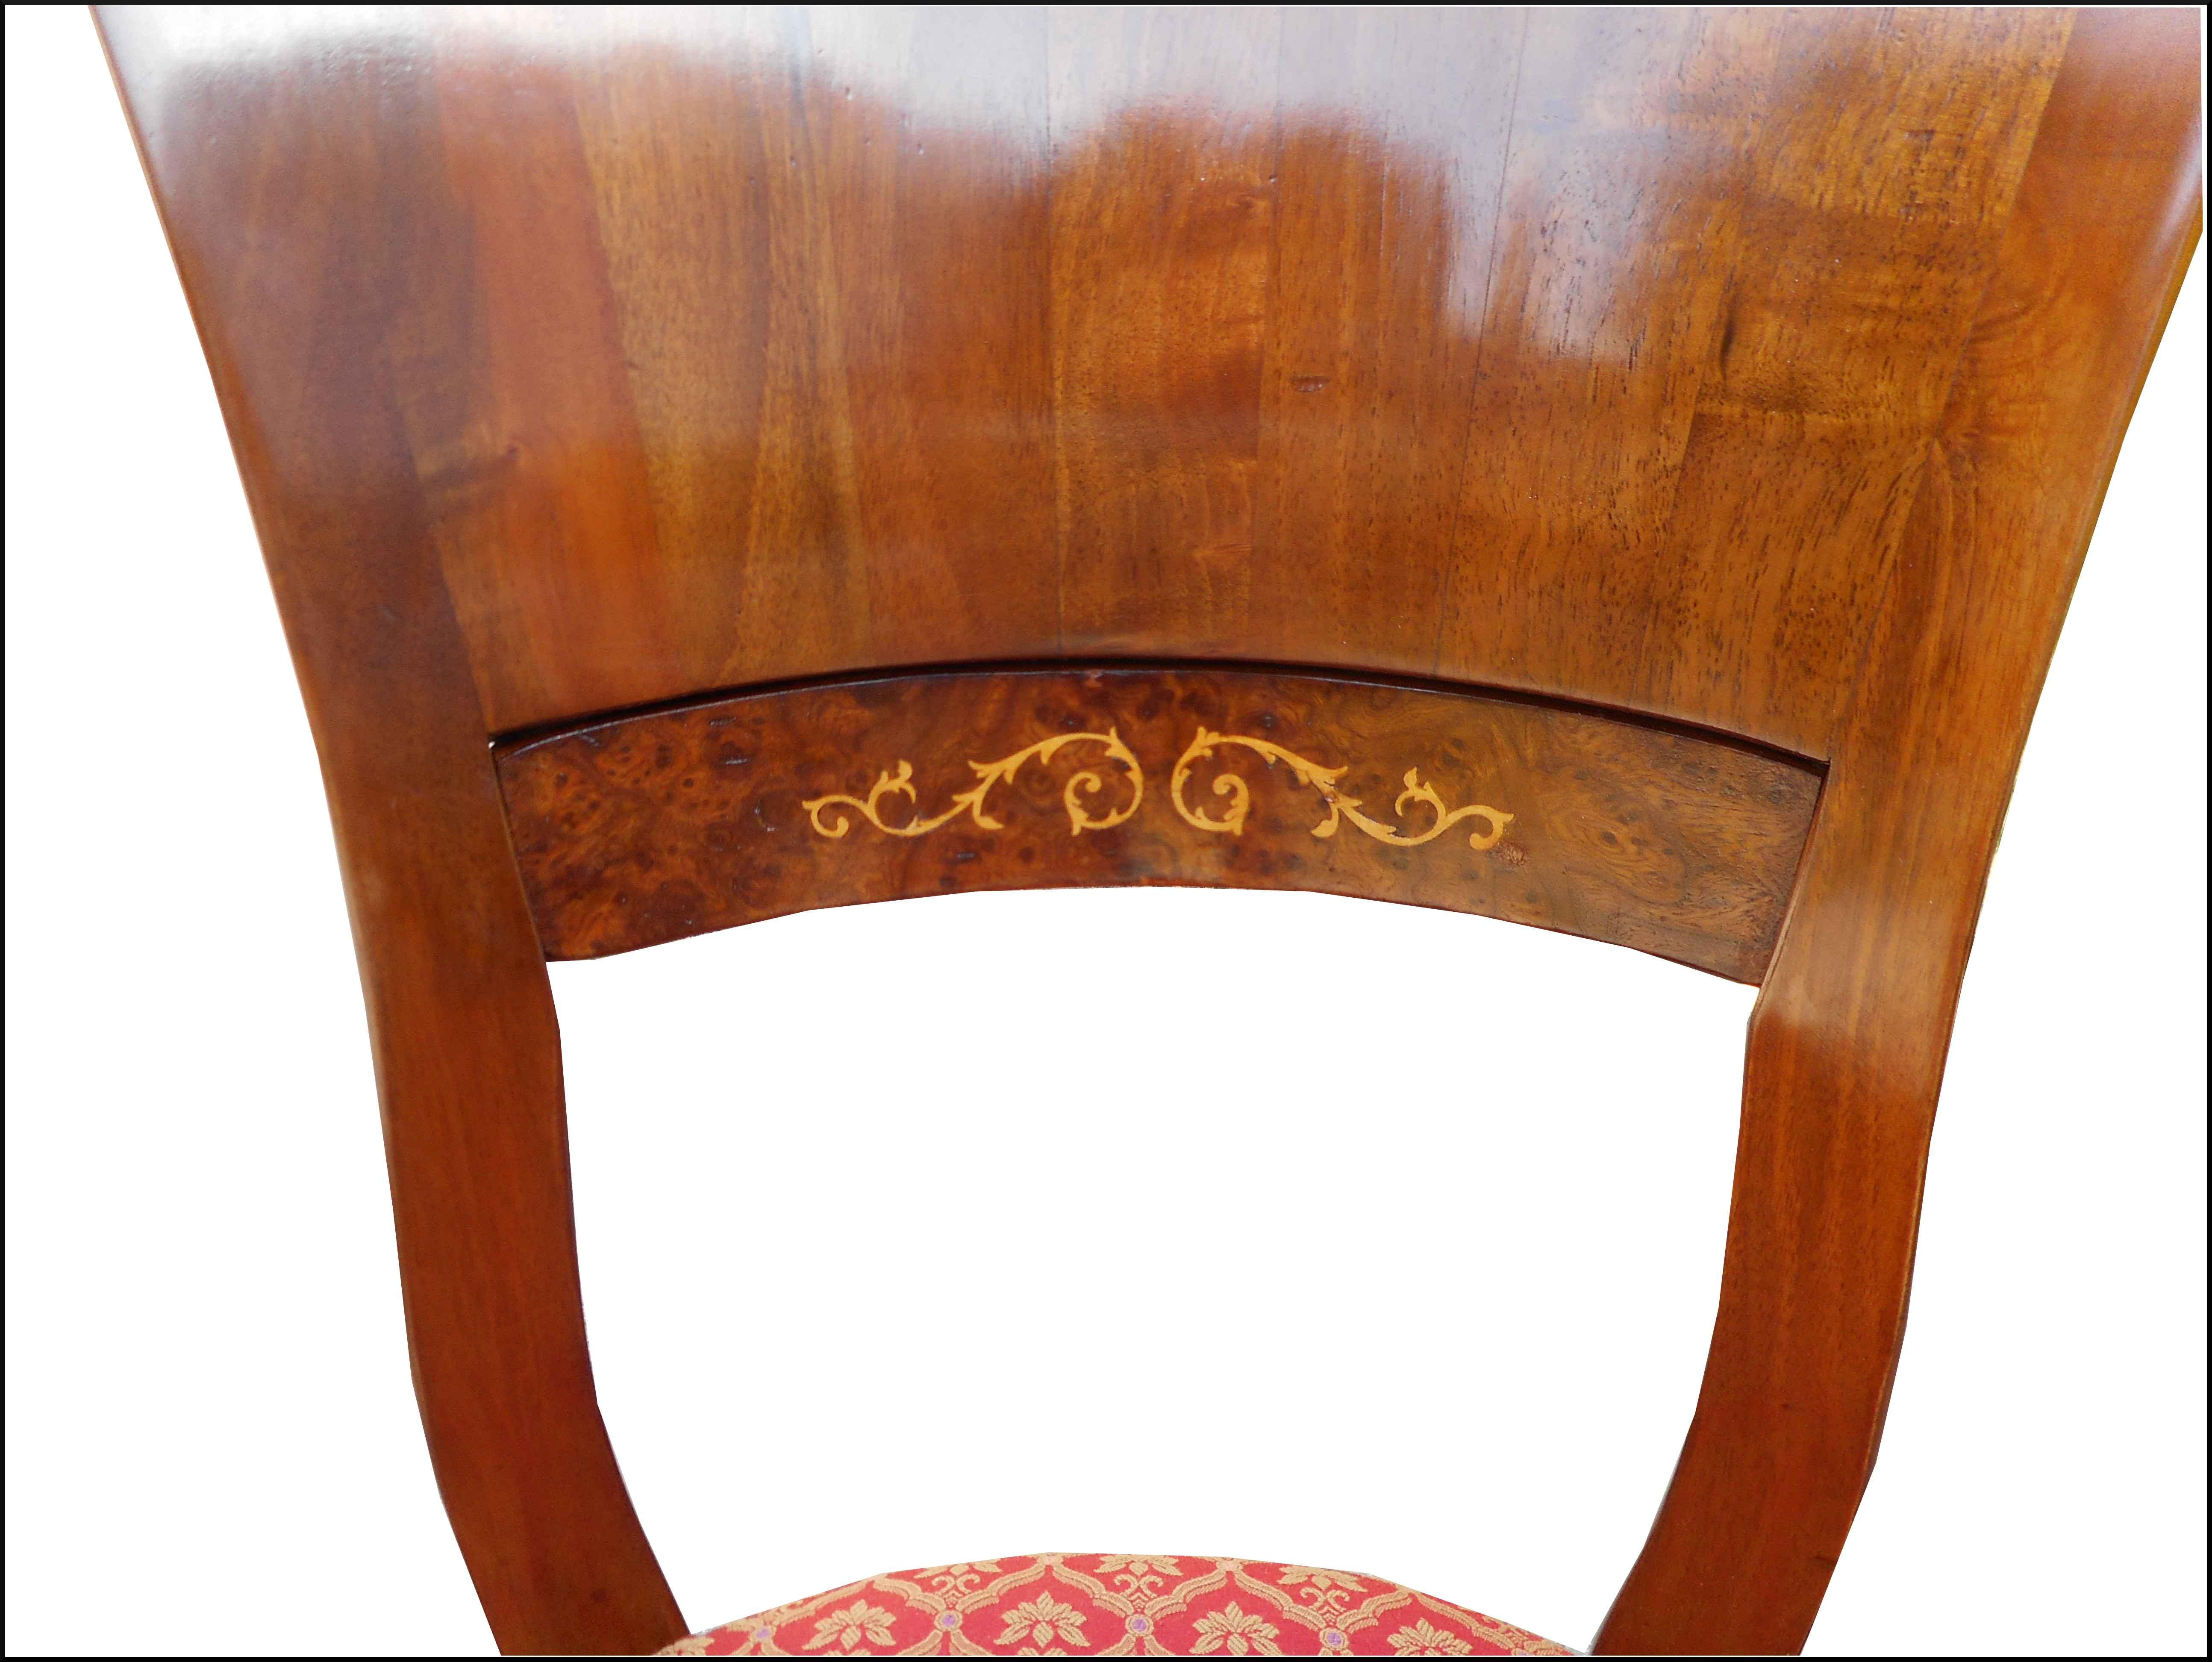 Elegante sedia stile 800 con intarsio